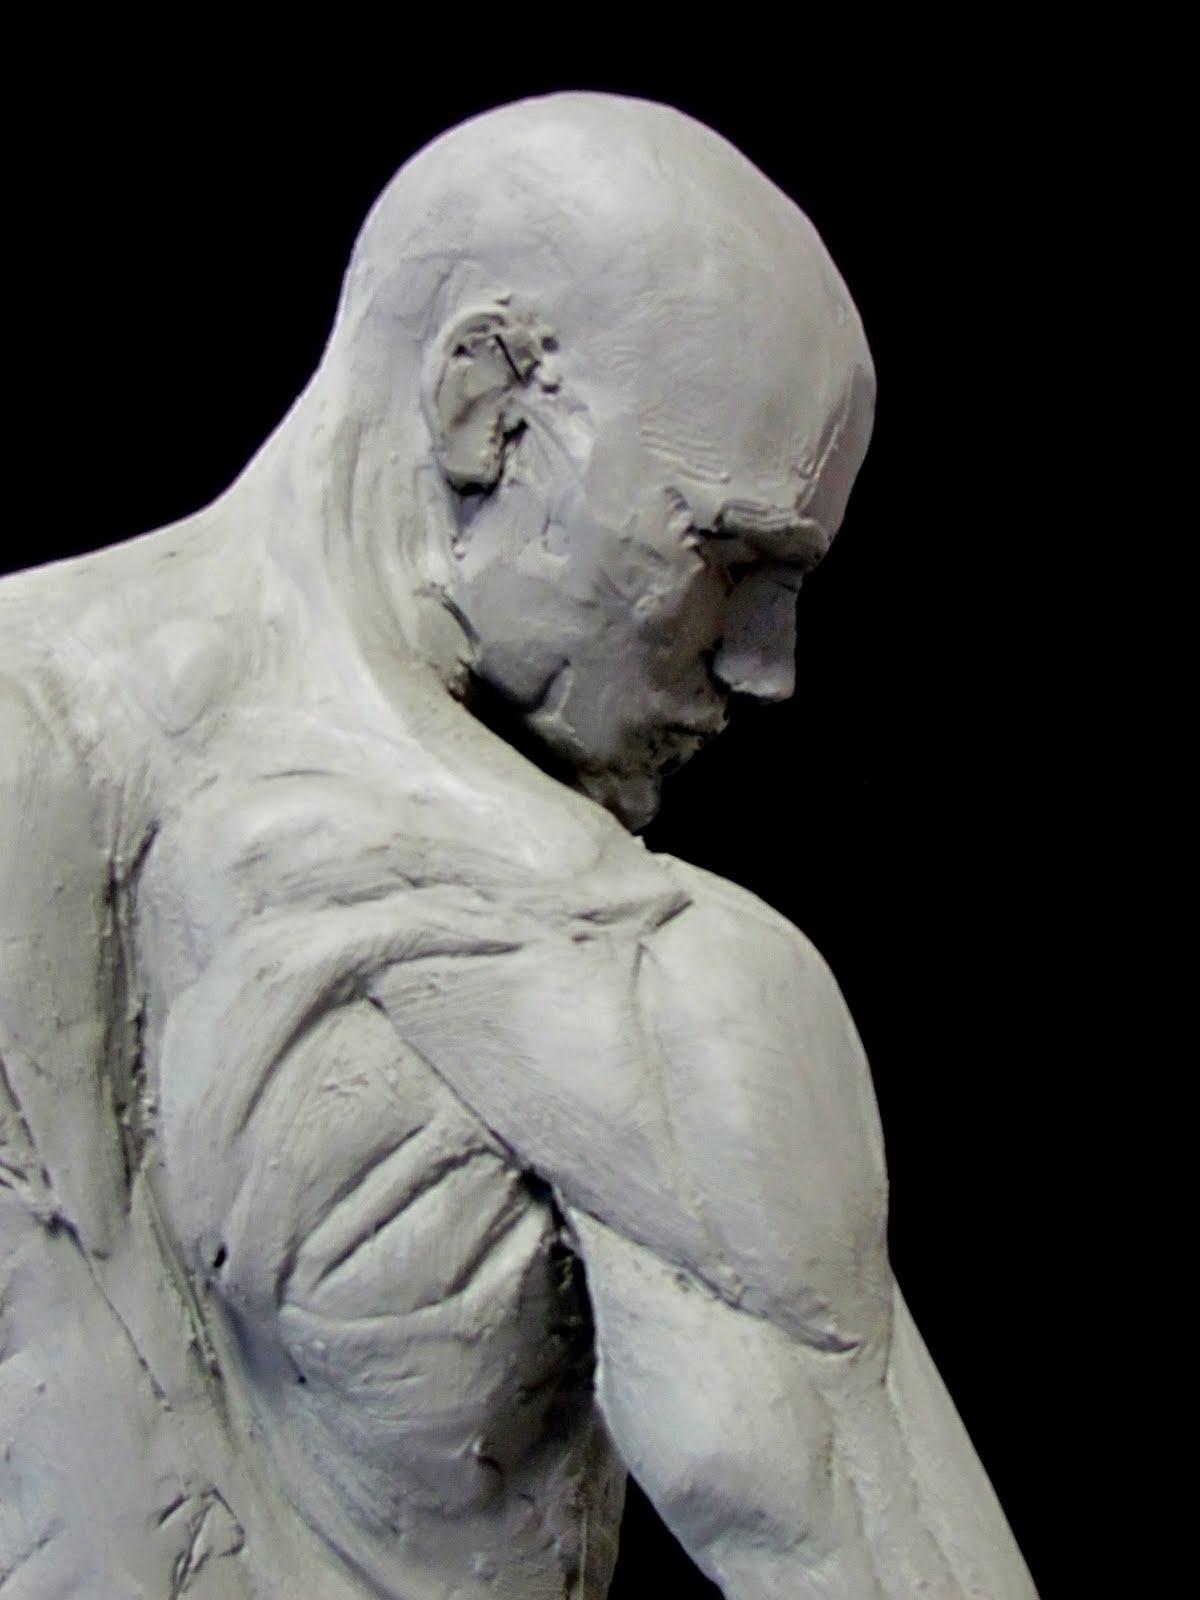 Skeletal System • Anatomy & Function - GetBodySmart